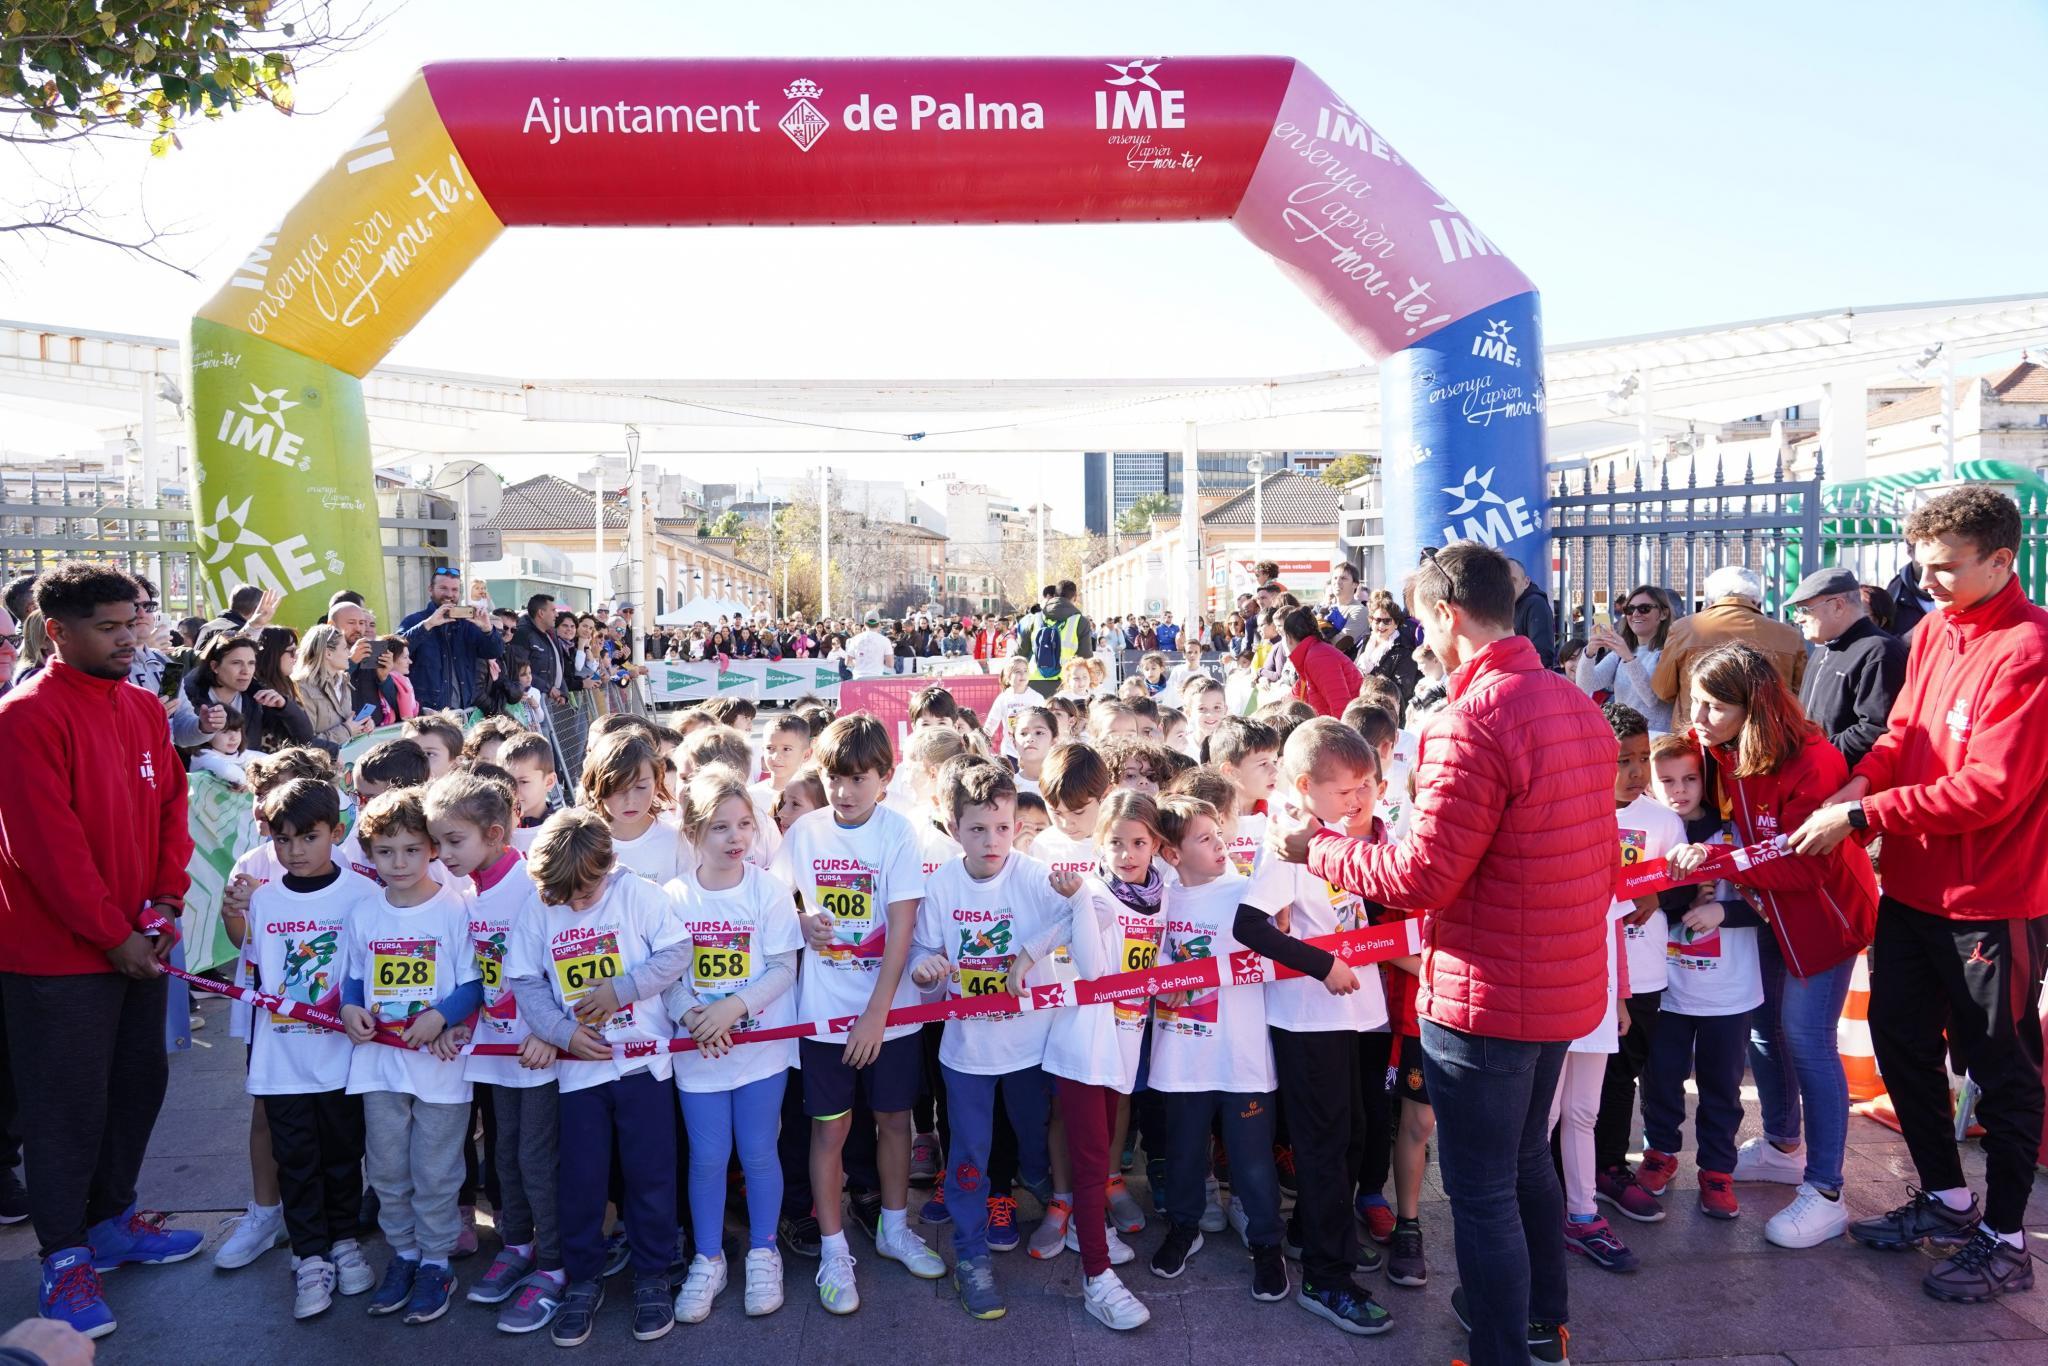 Three Kings childrens' race in Palma